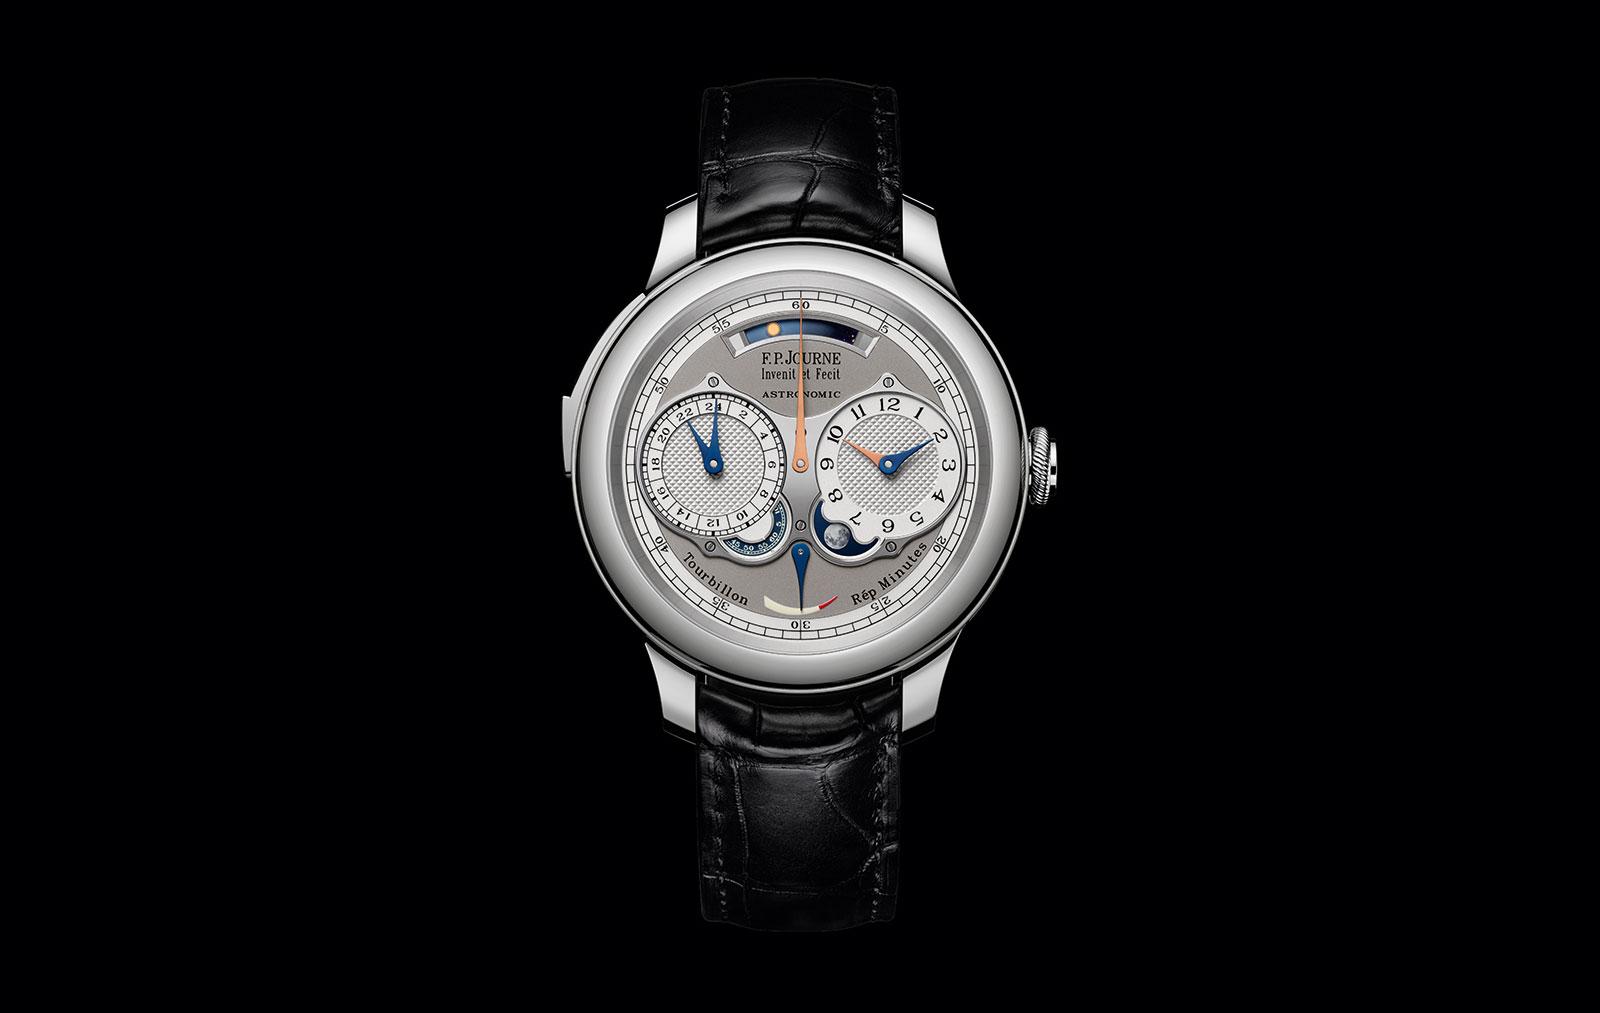 F.P. Journe Introduces the Astronomic Souveraine Grand Complication   SJX Watches